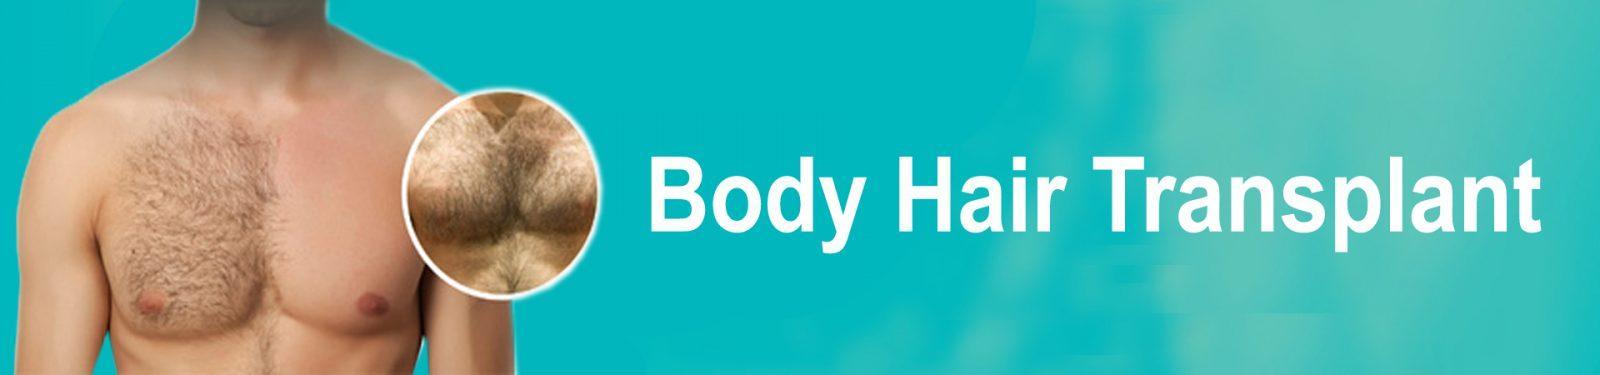 body h t